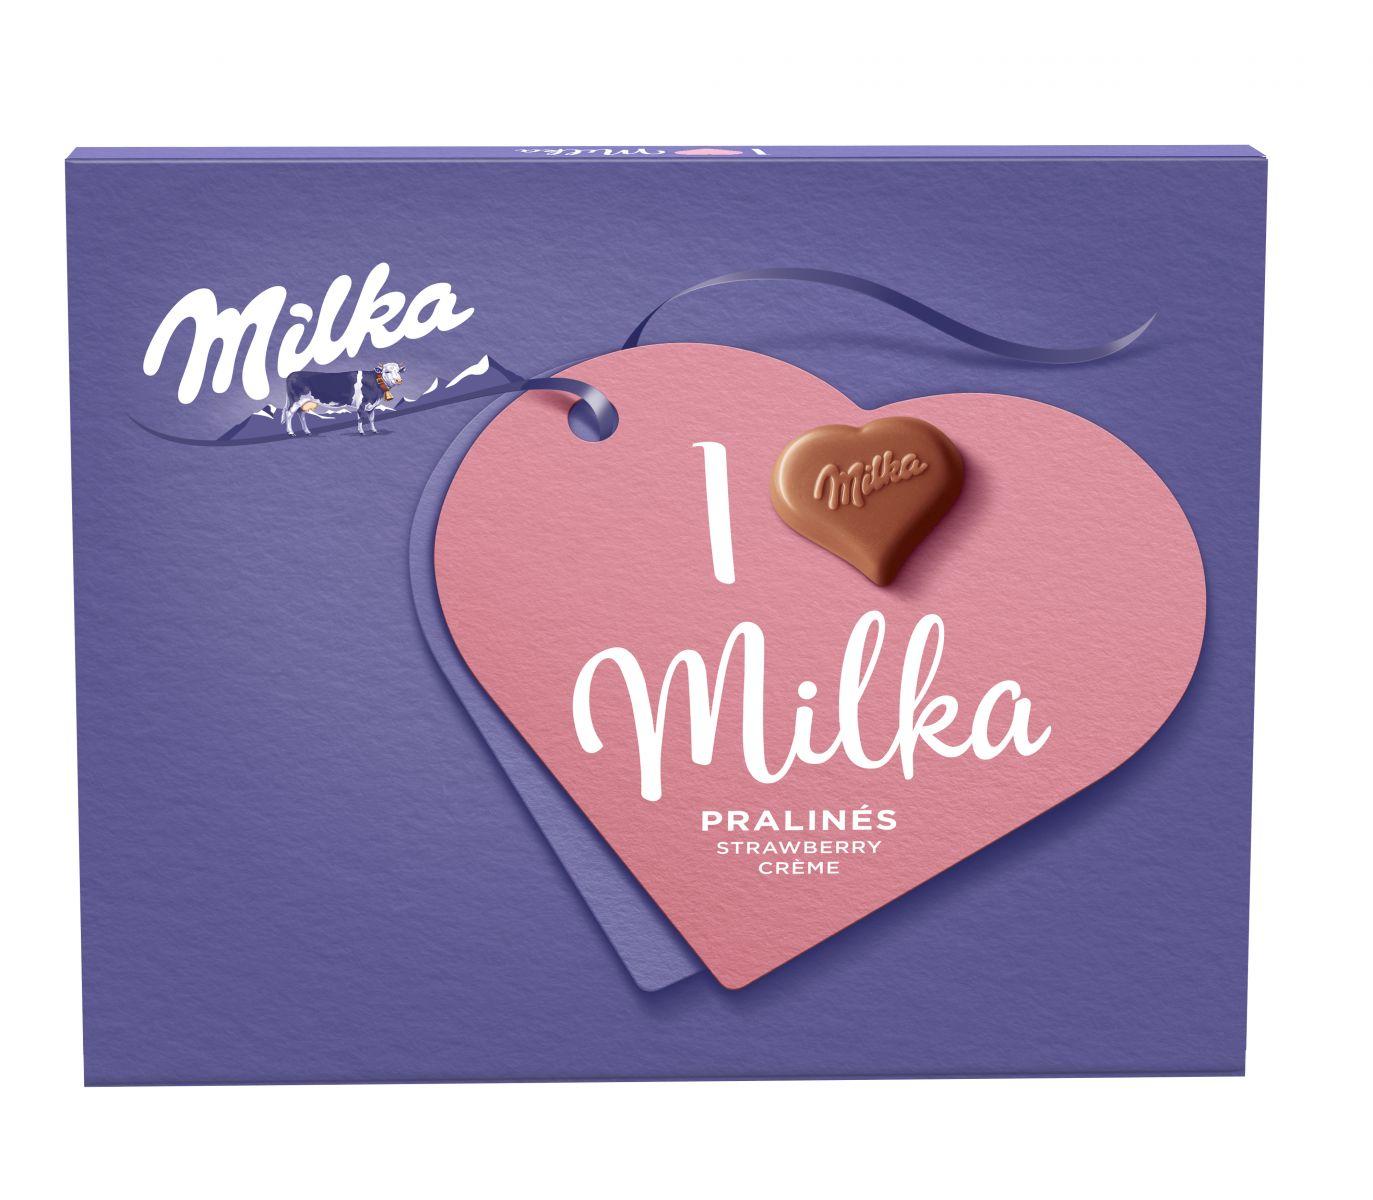 Milka ILM Strawberry 110g Front_300dpi